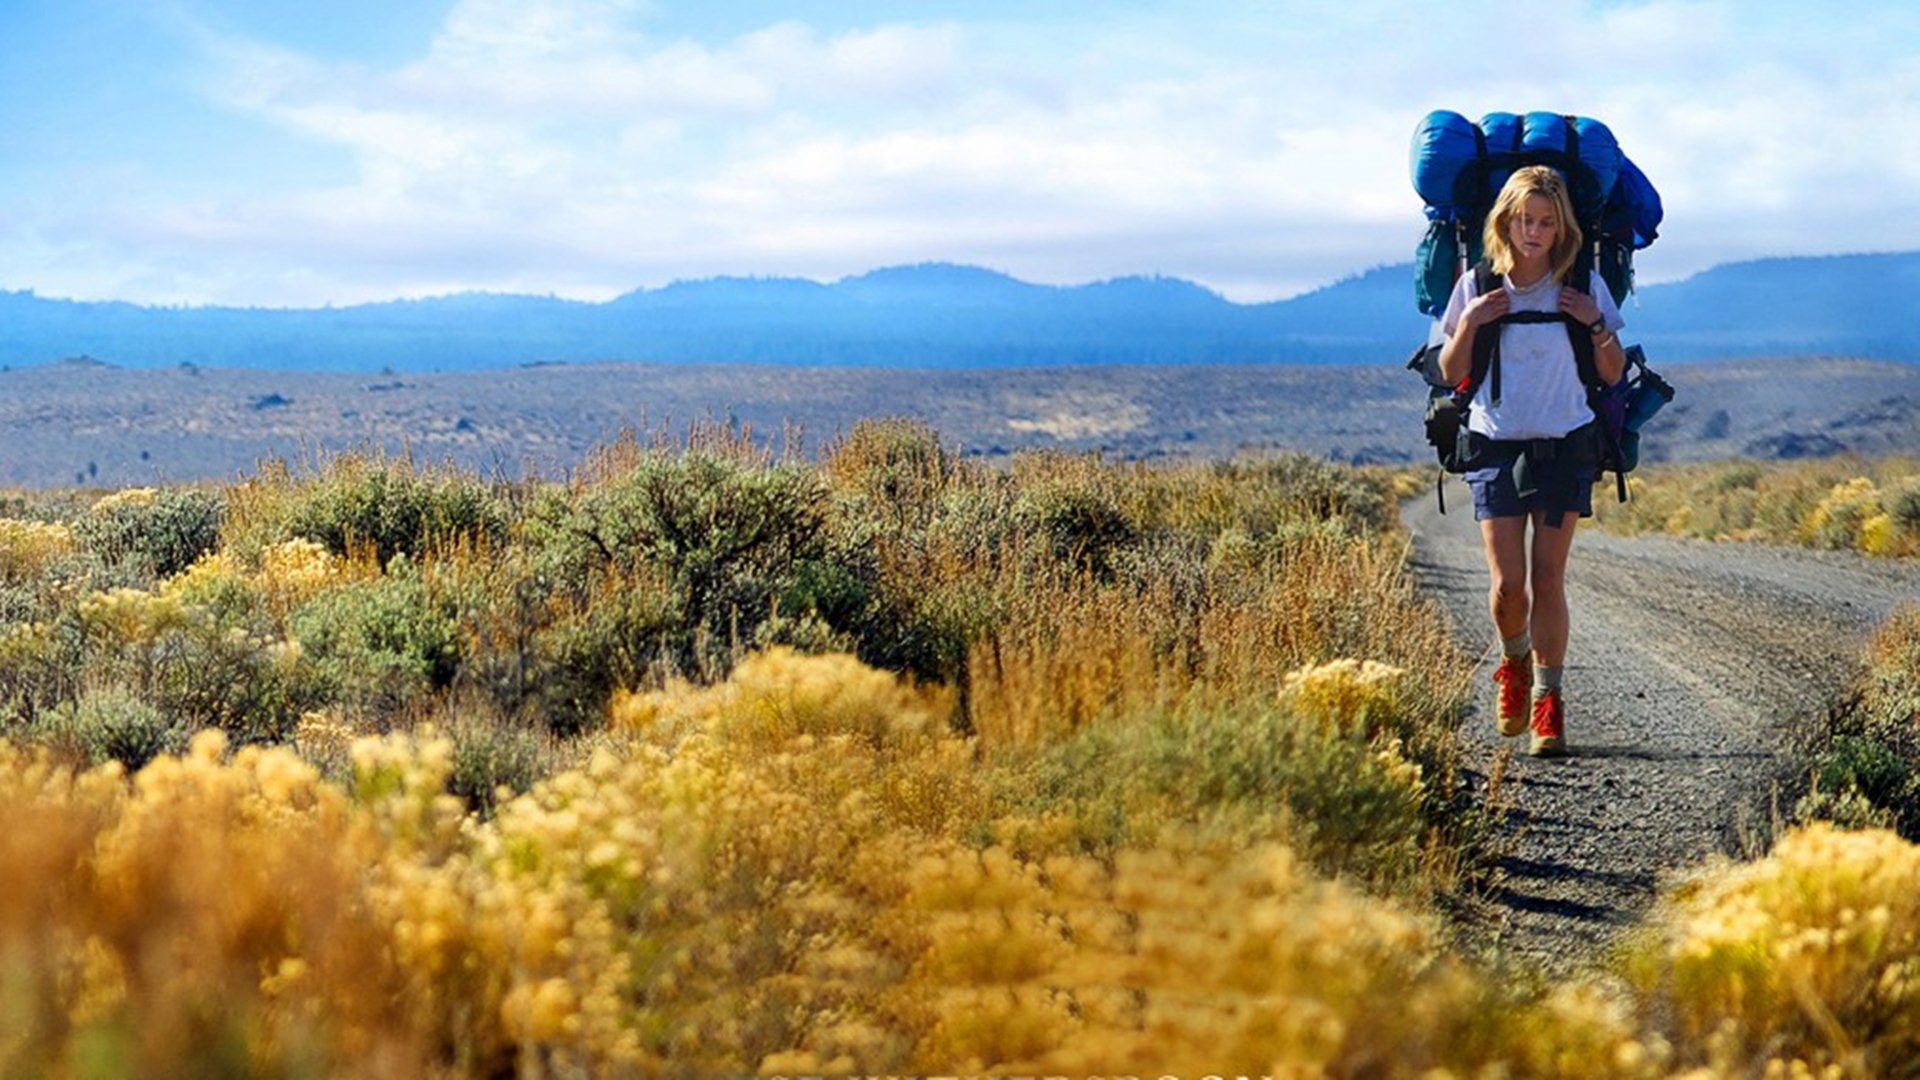 """Wild"": Πώς είναι να τα παρατάς όλα και να παίρνεις τα βουνά"